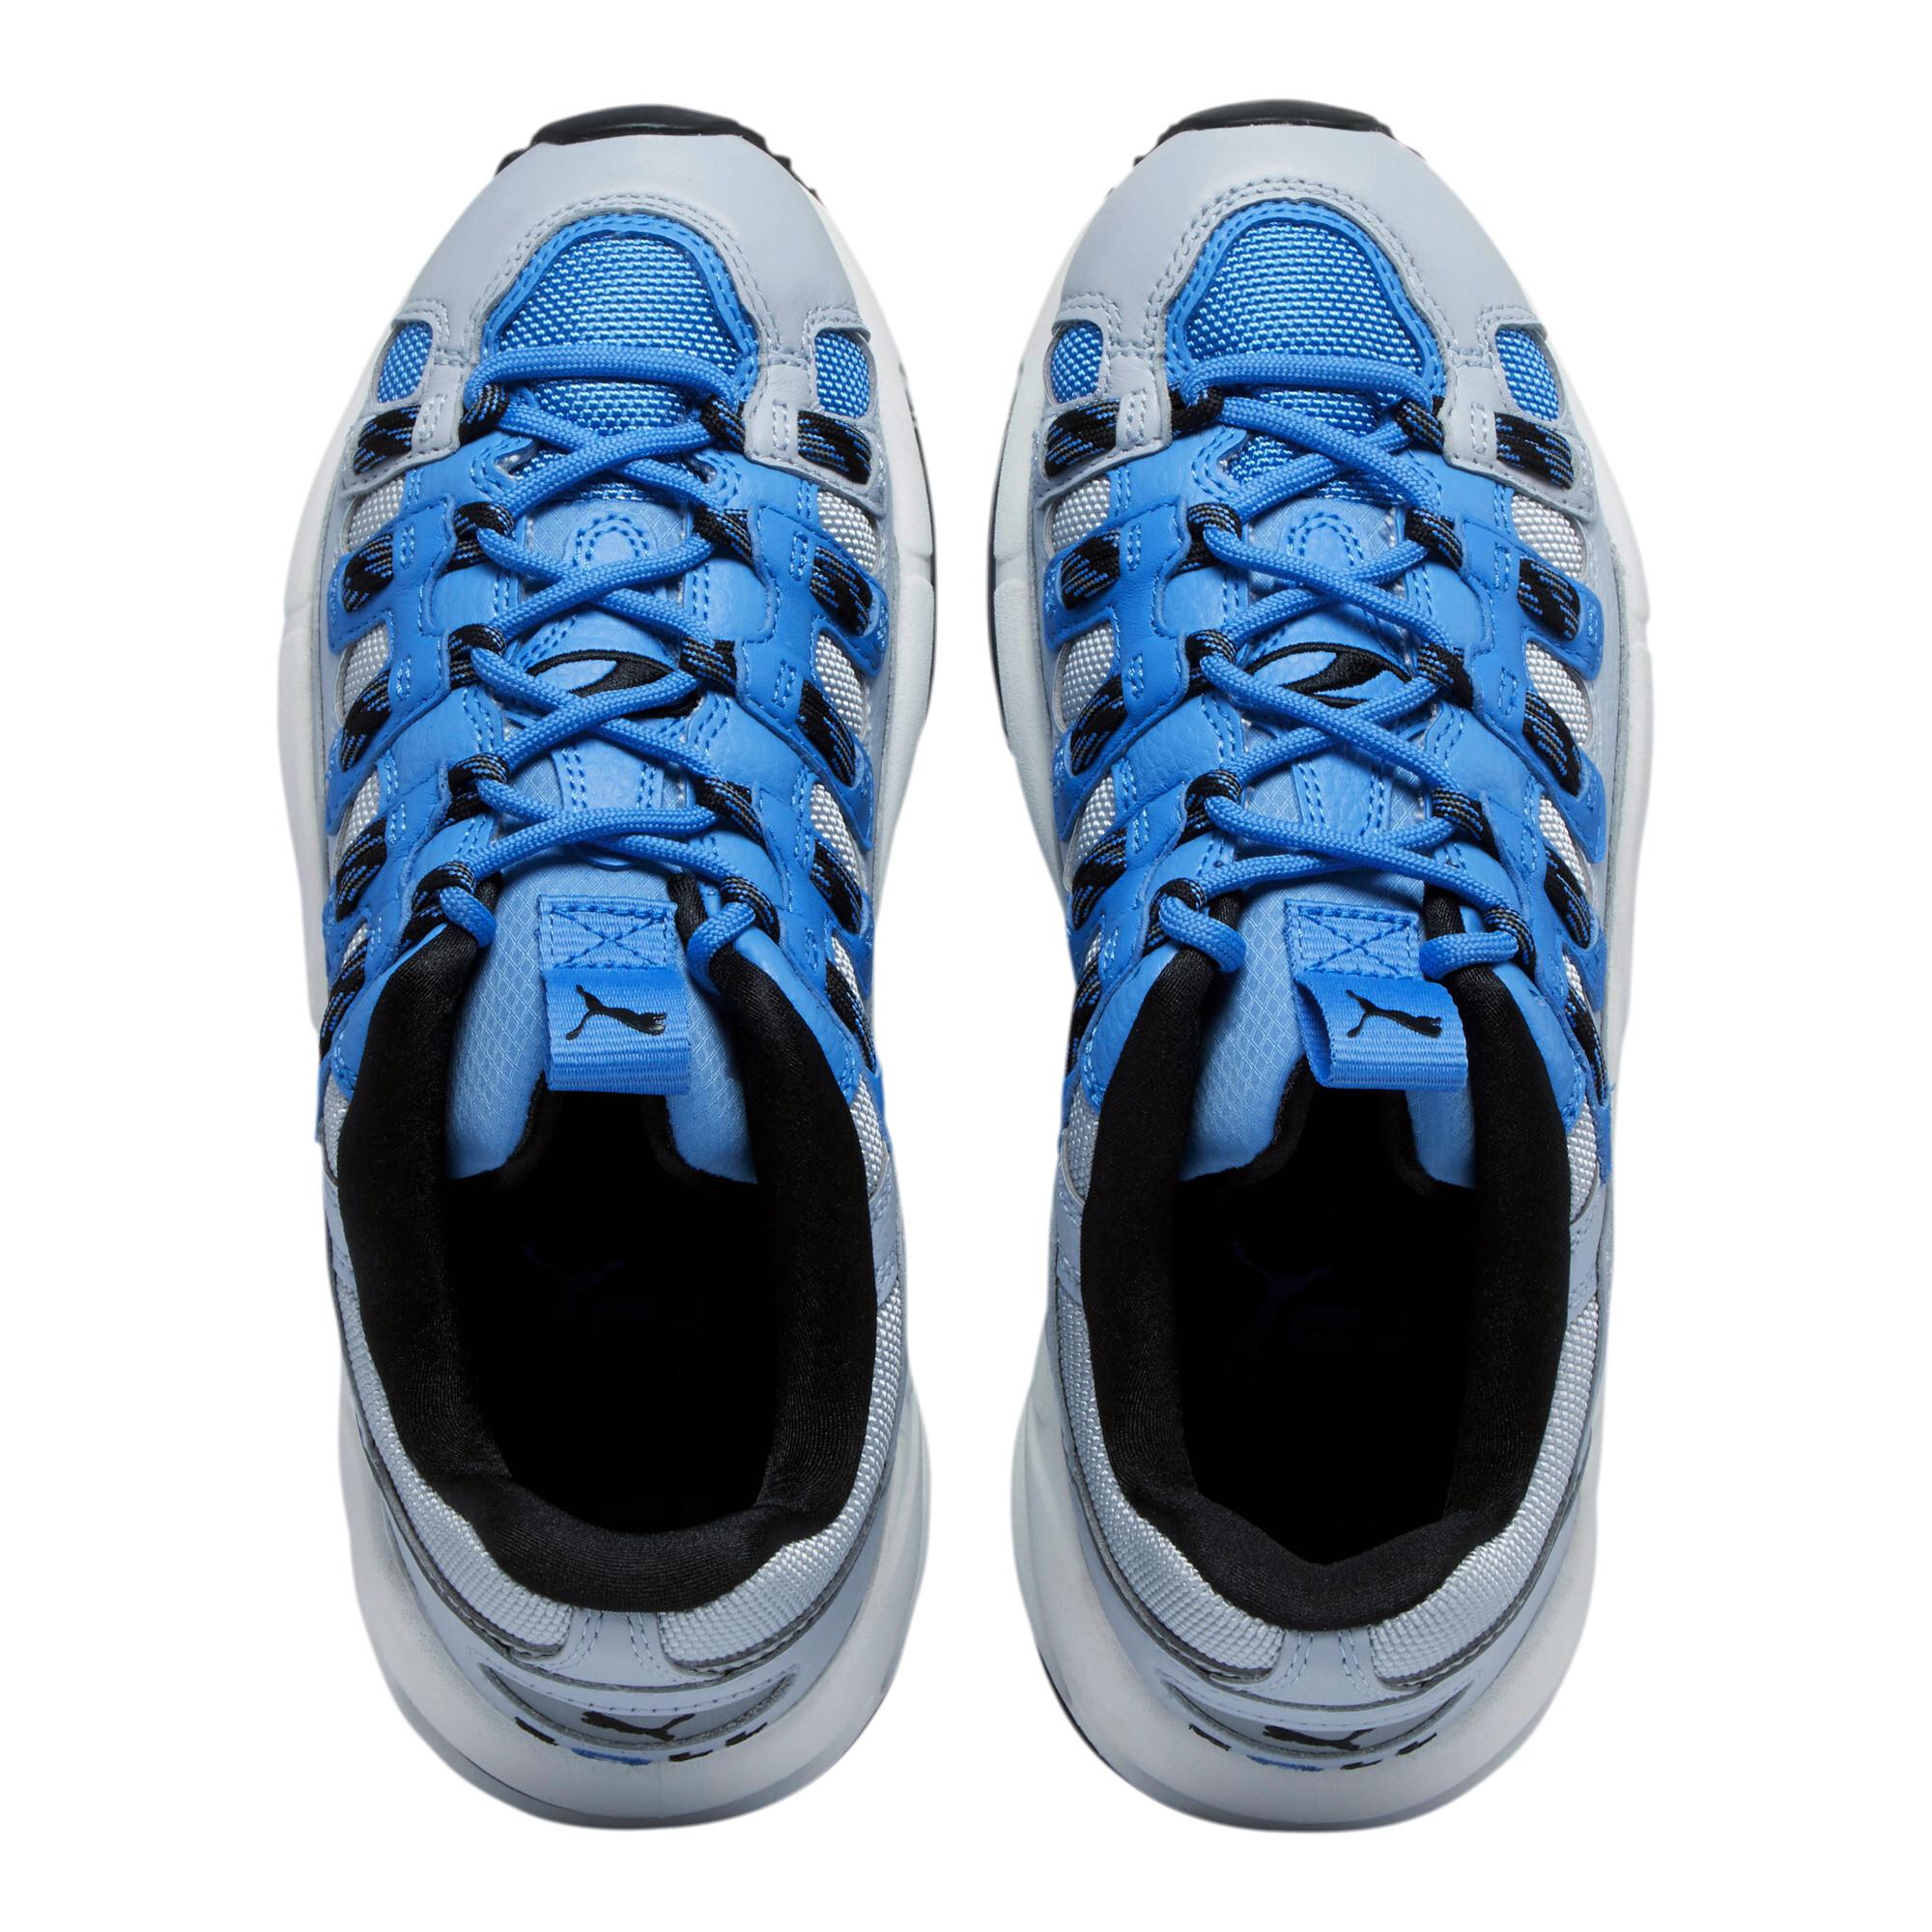 PUMA-CELL-Endura-Rebound-Women-039-s-Sneakers-Women-Shoe-Sport-Classics thumbnail 7